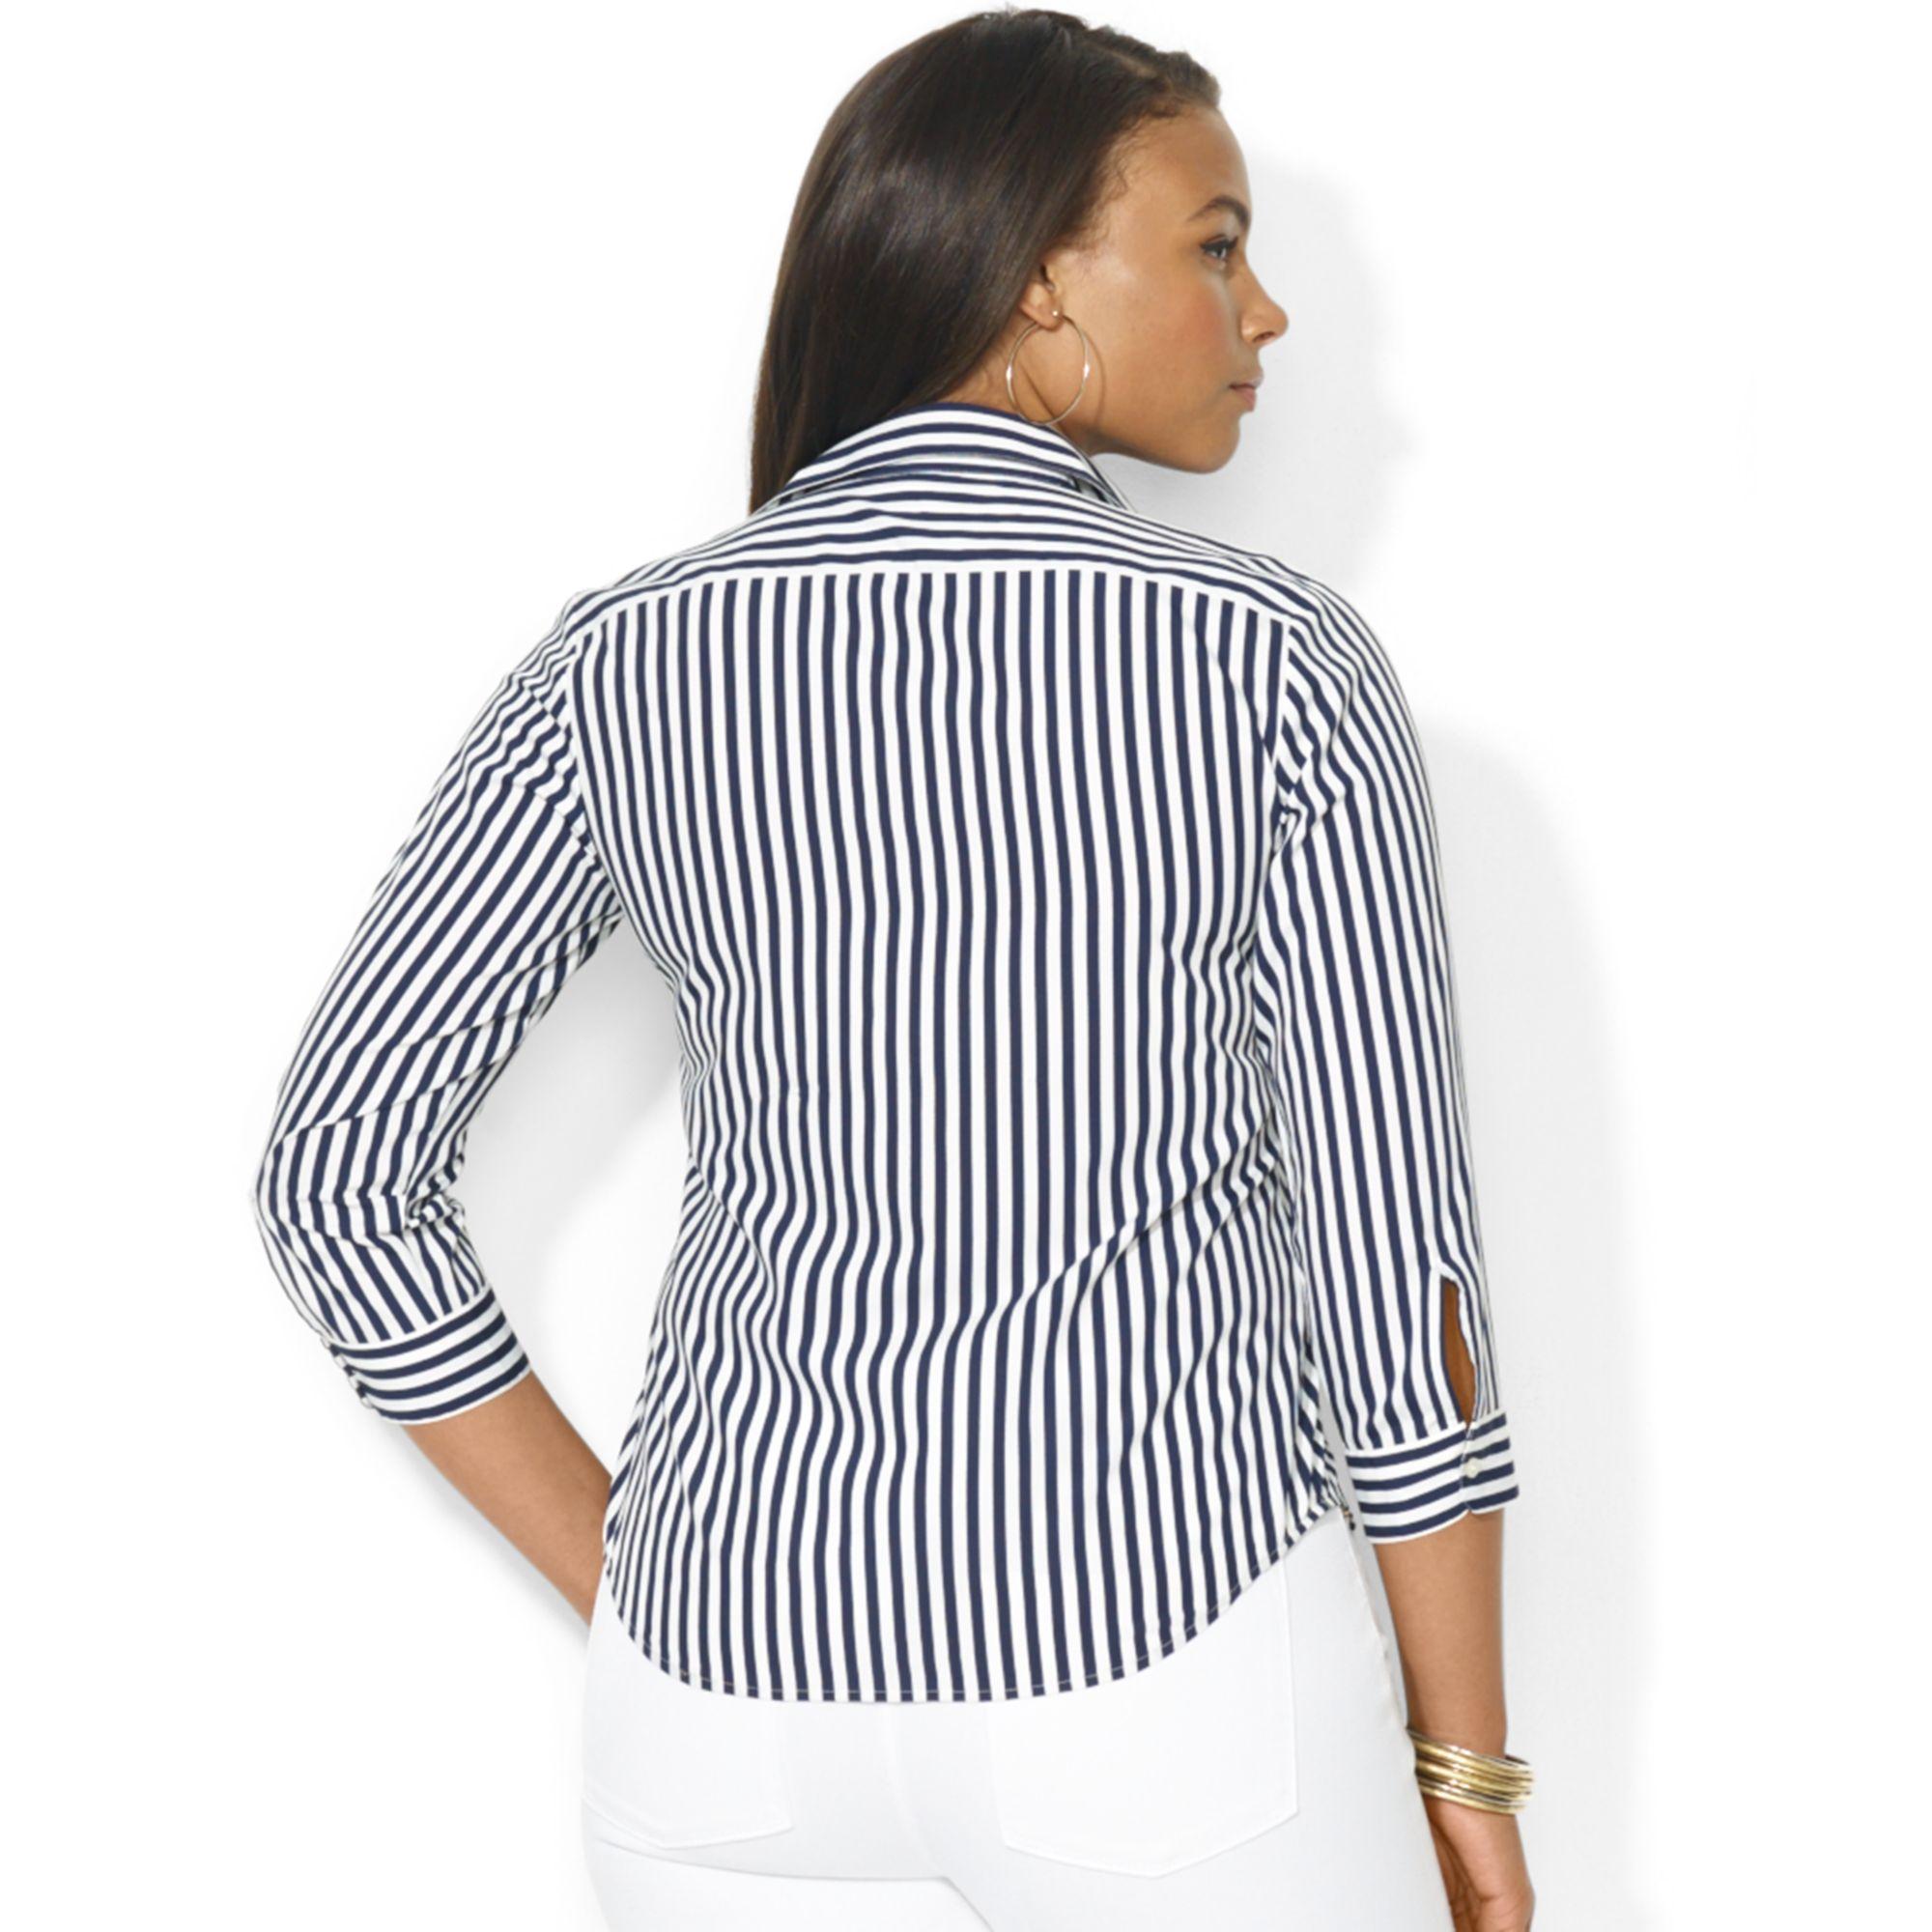 Lyst lauren by ralph lauren plus size threequartersleeve for Three quarter length shirt